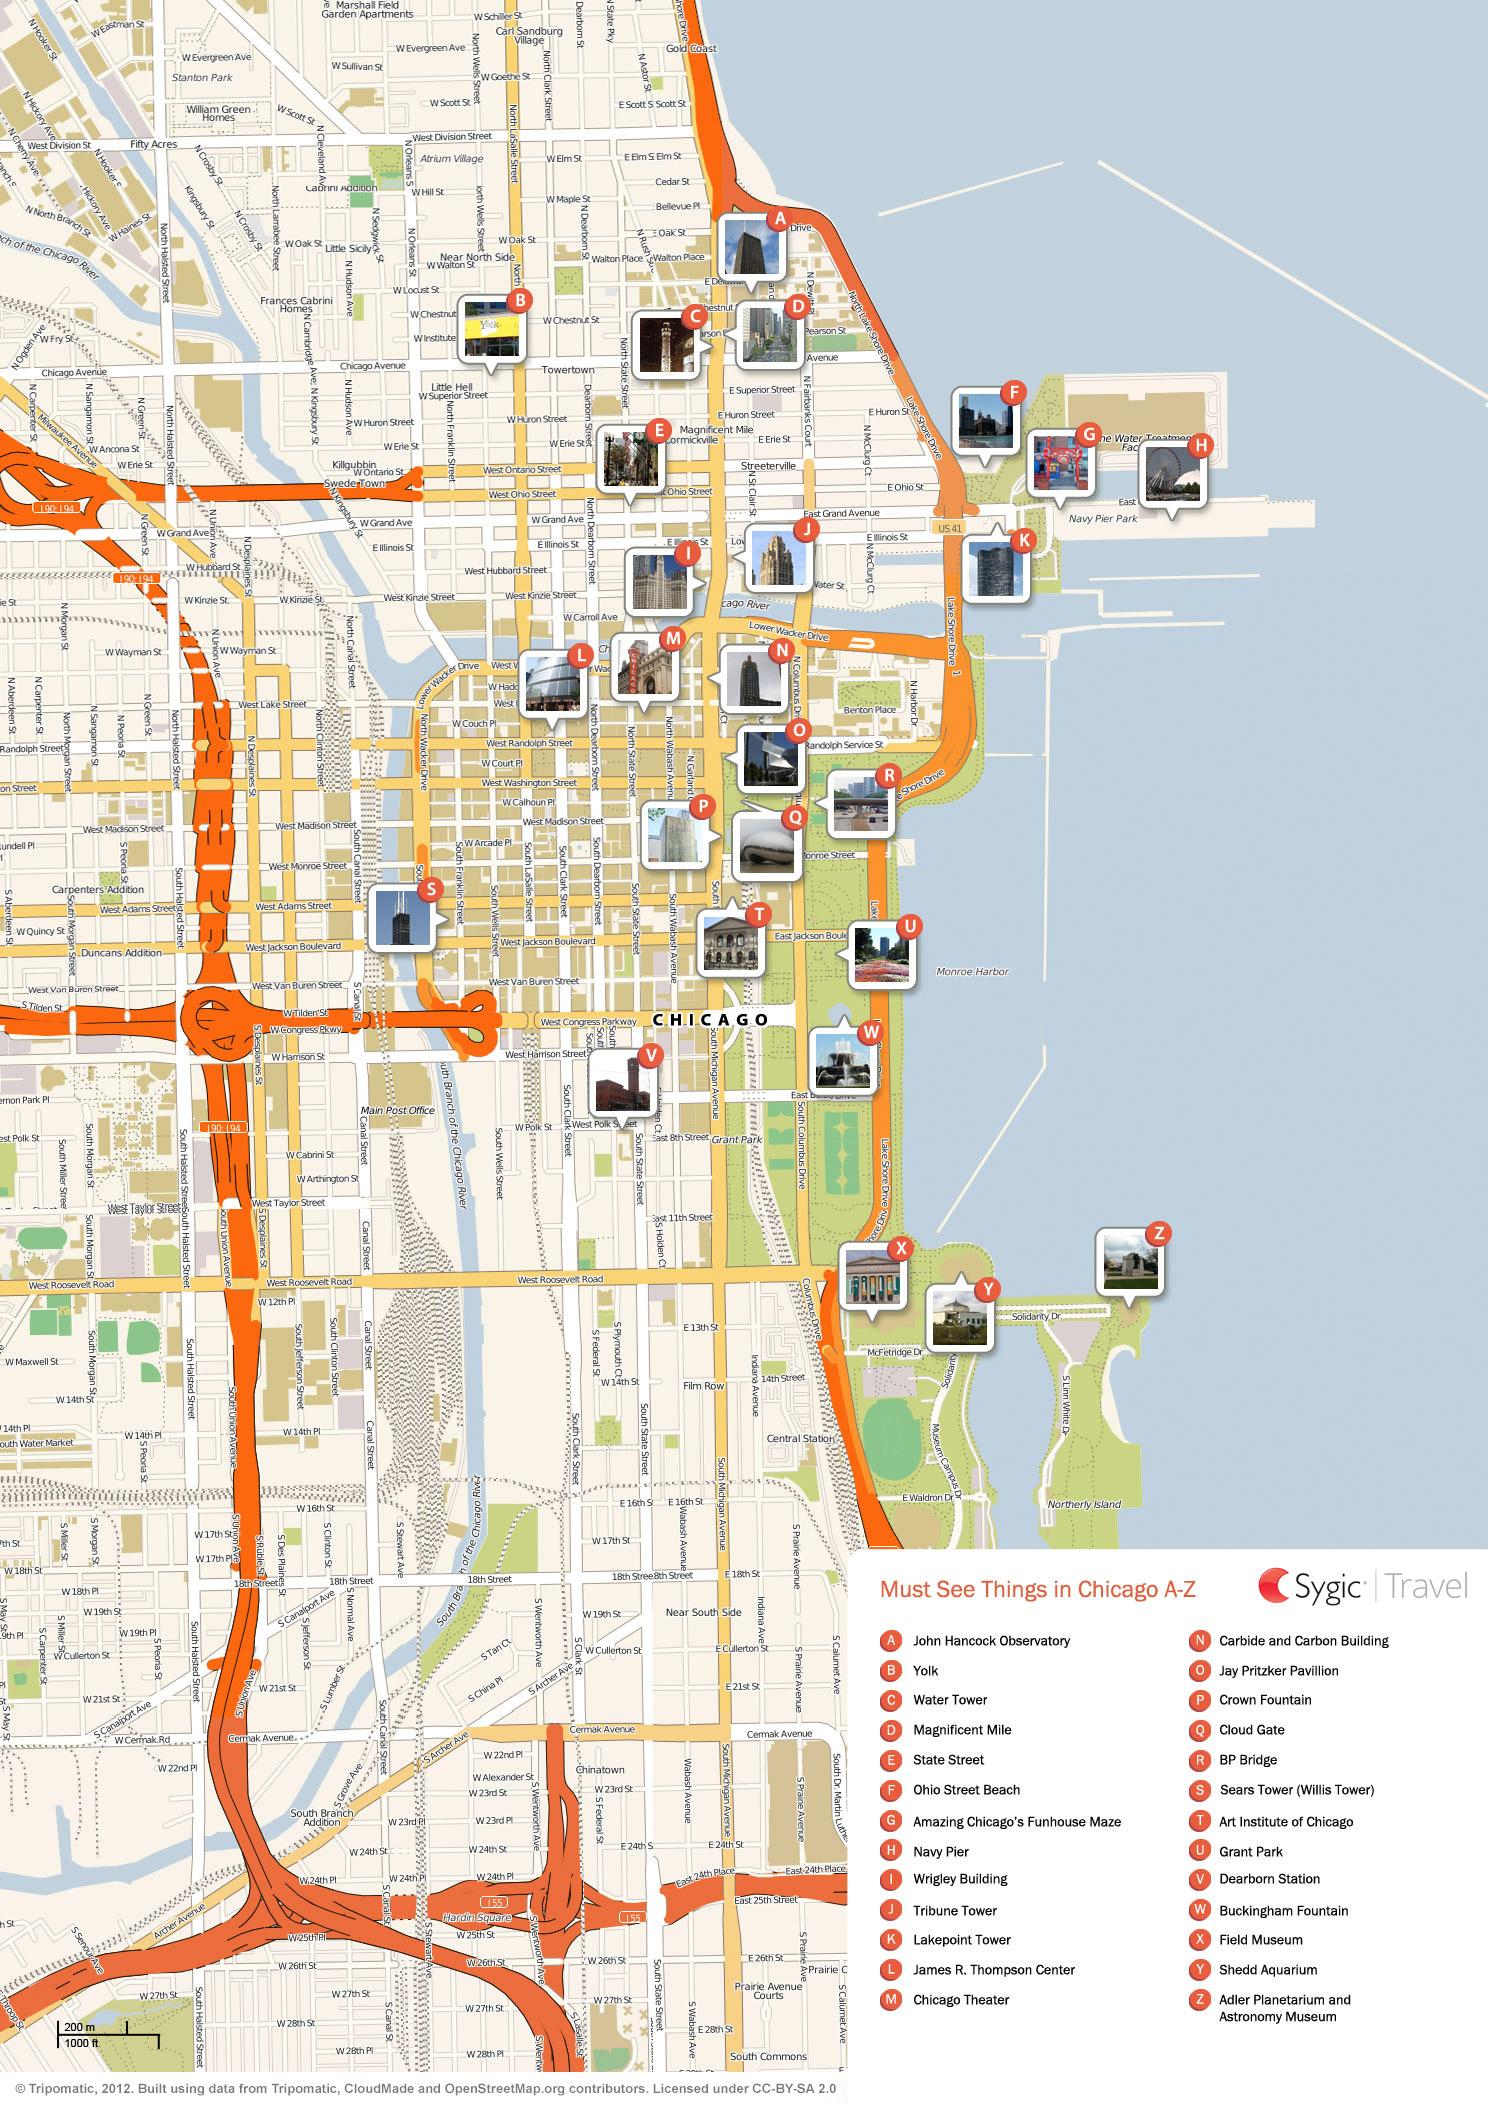 Chicago Tourist Map